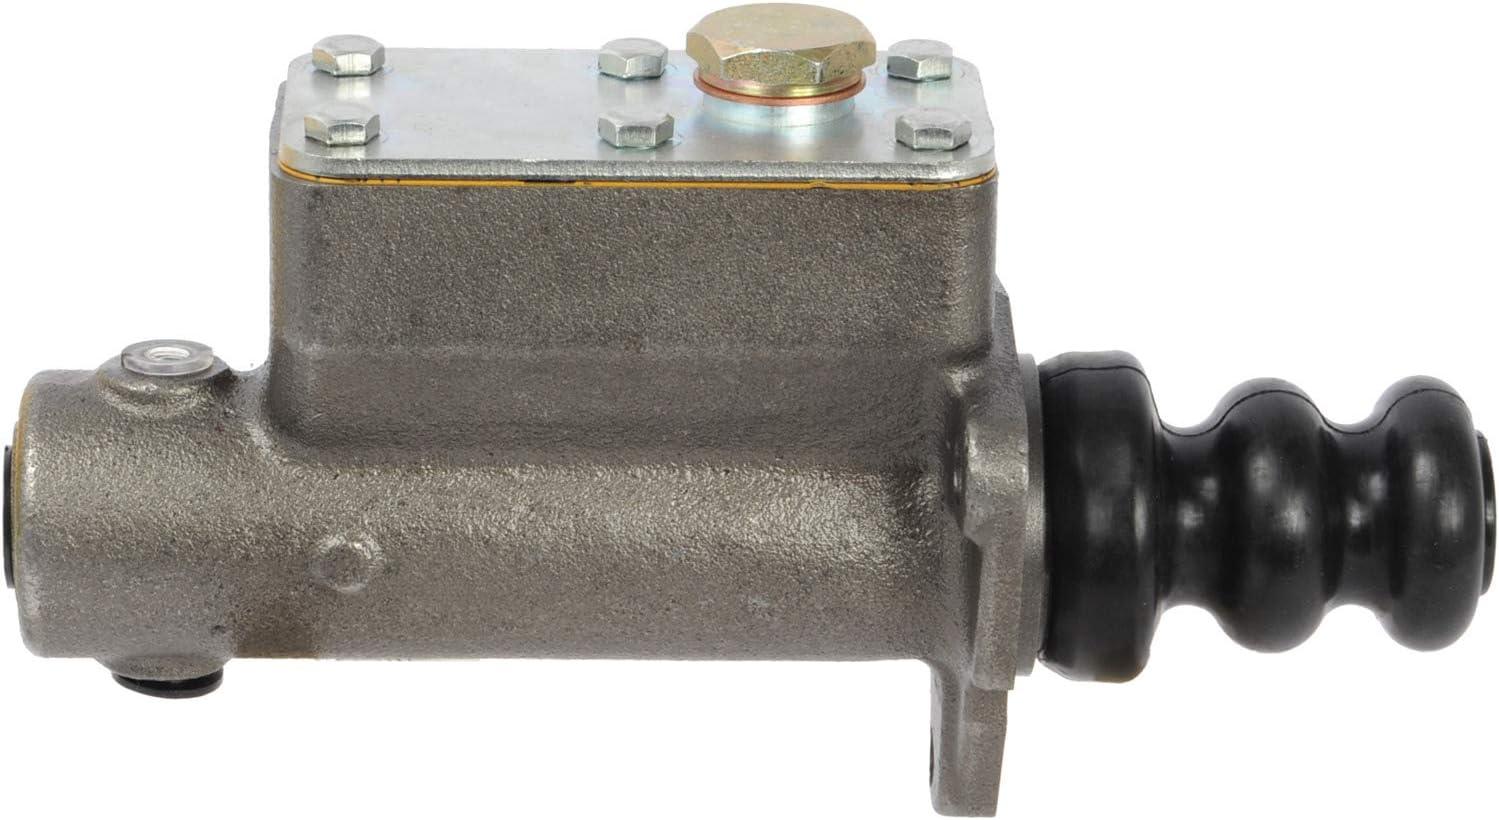 Max 74% OFF Cardone 13-35126 New Master Phoenix Mall Brake Cylinder